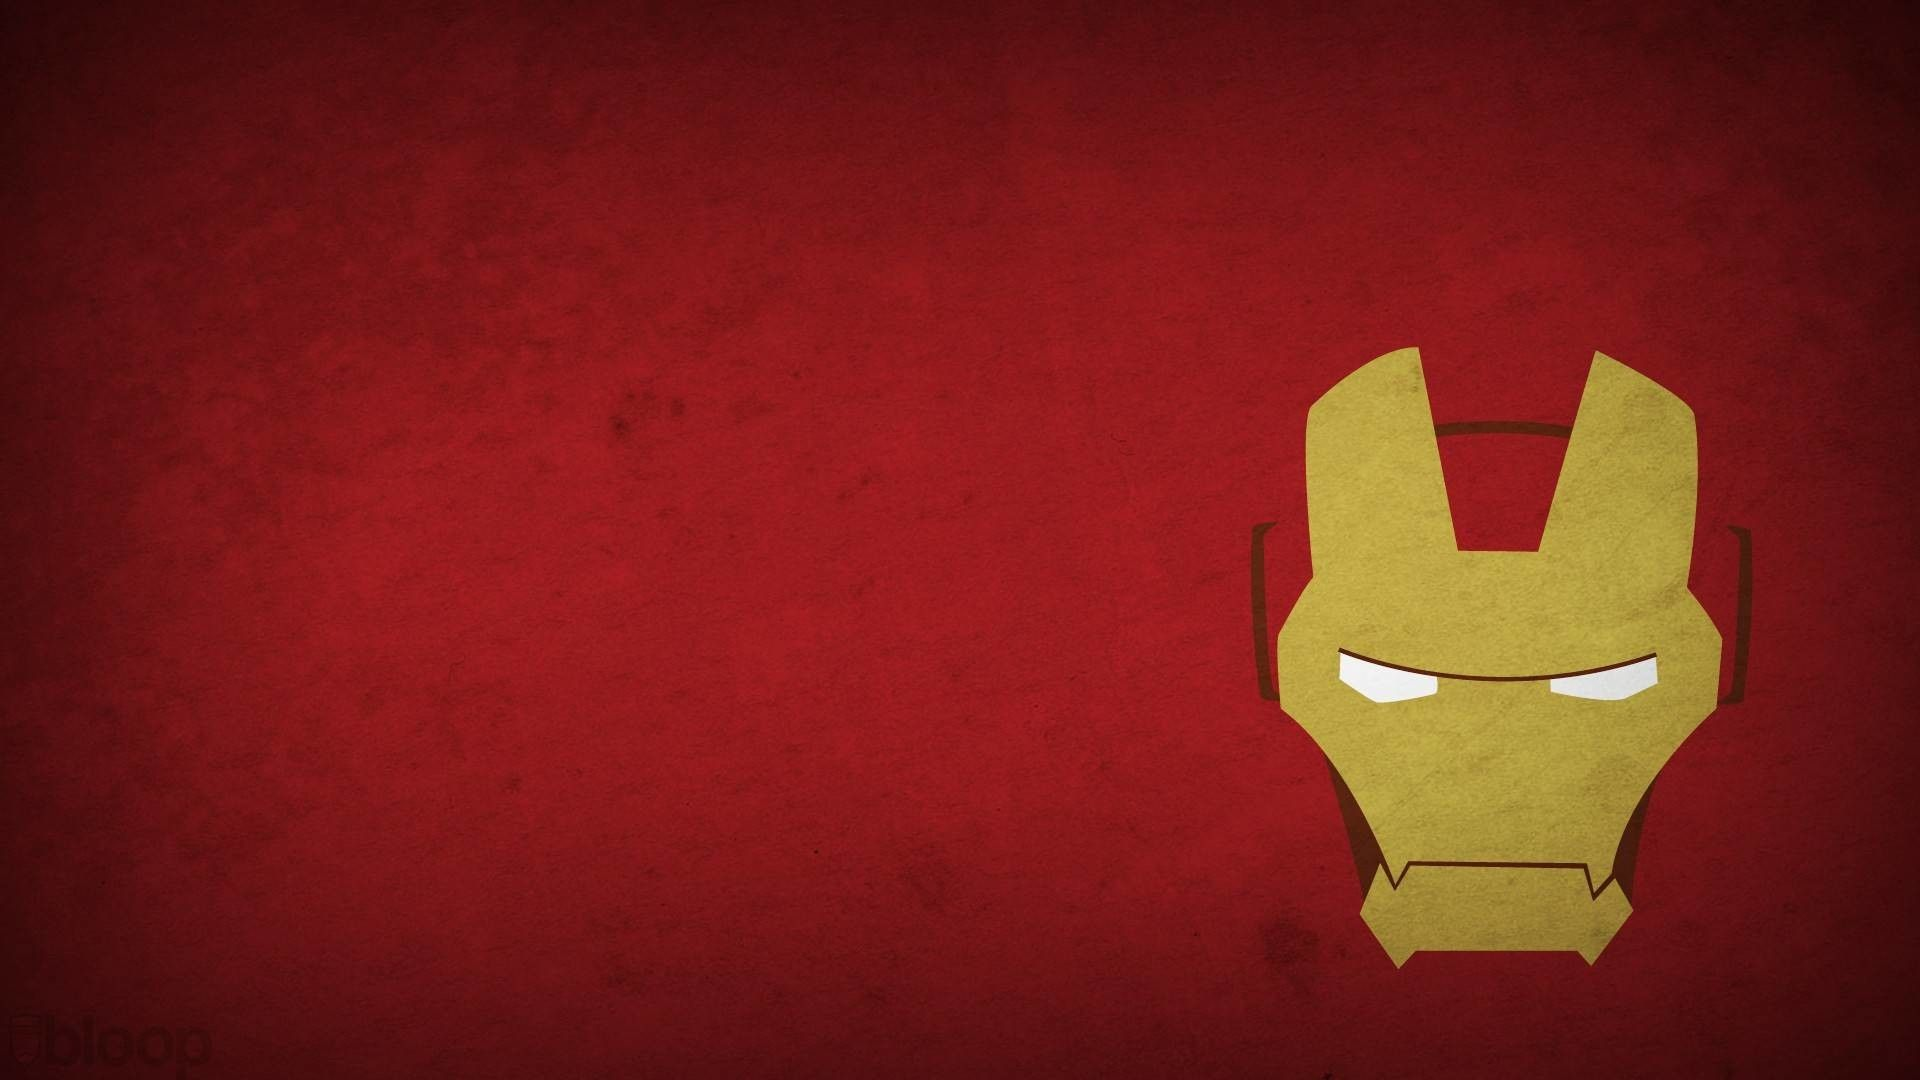 Minimalist Iron Man Wallpaper Iphone